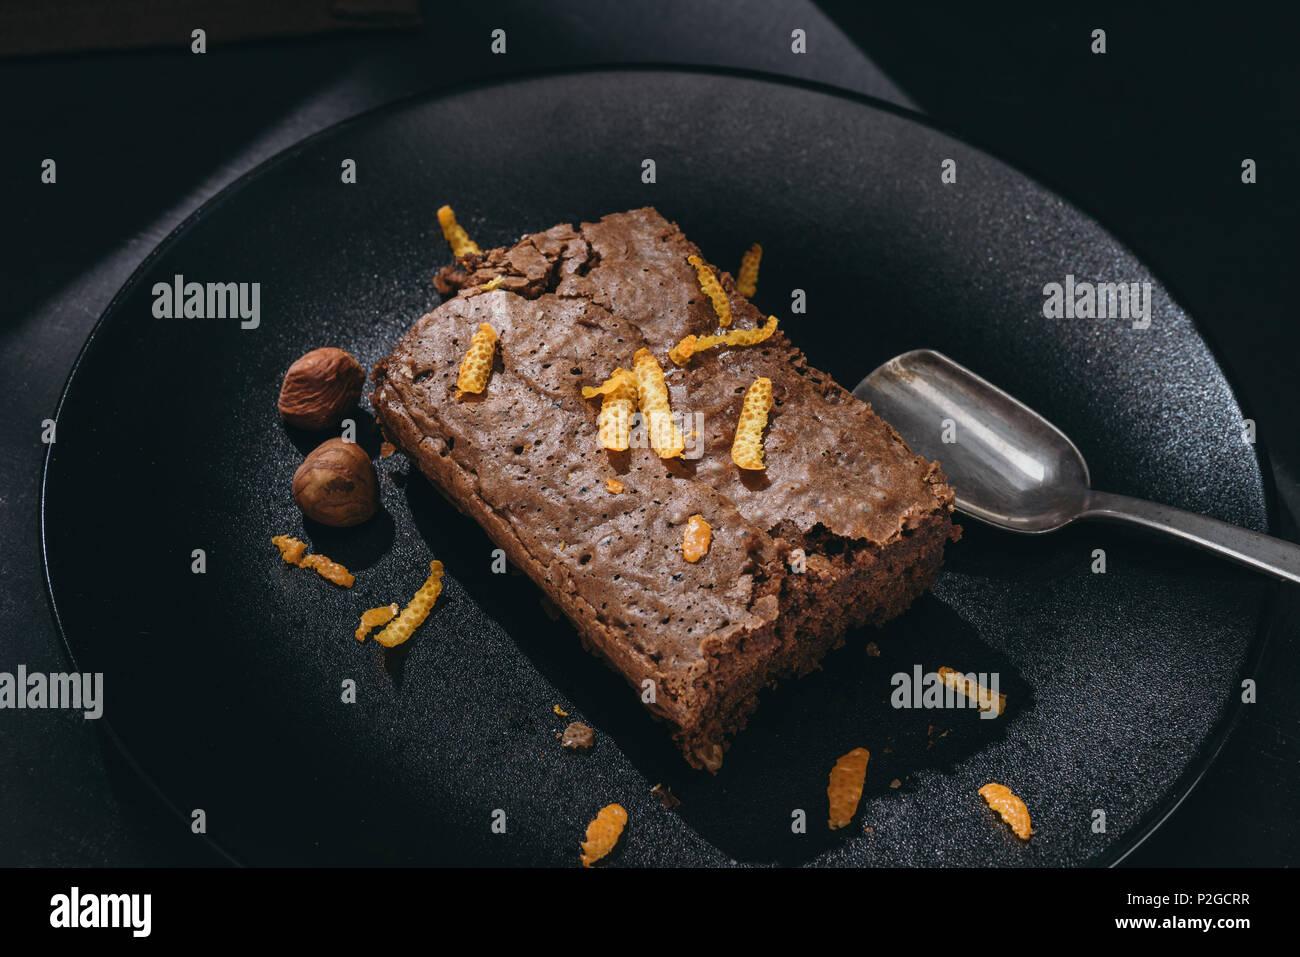 Primer plano de tarta de chocolate con la ralladura de naranja en la placa negra Imagen De Stock